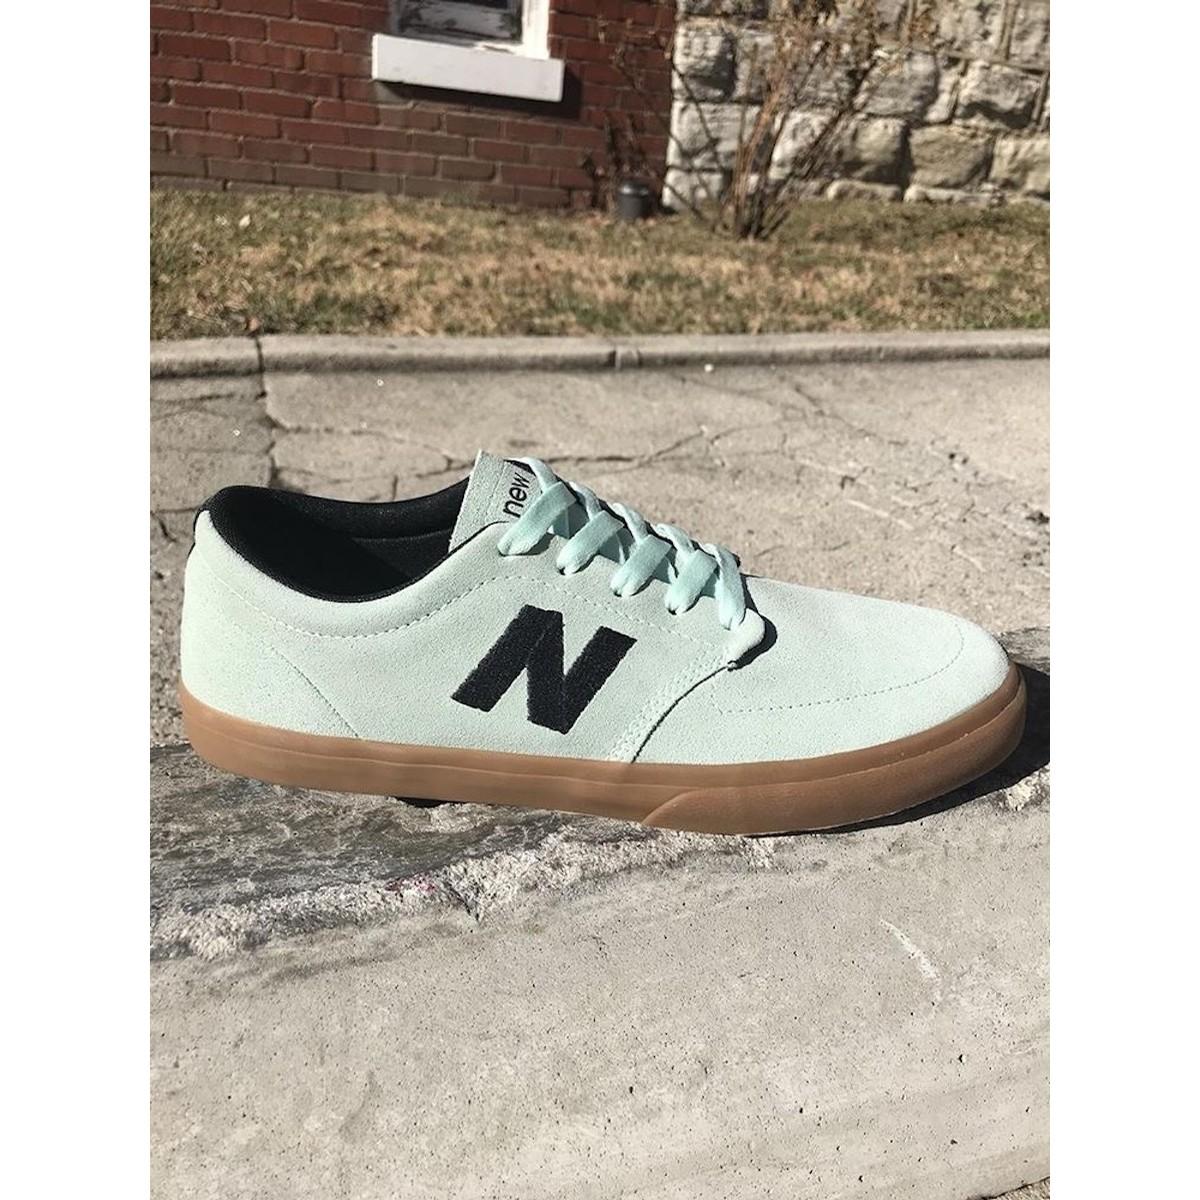 9c58fcc041 New Balance Numeric 345 Mint Gum Footwear at Home Skateshop